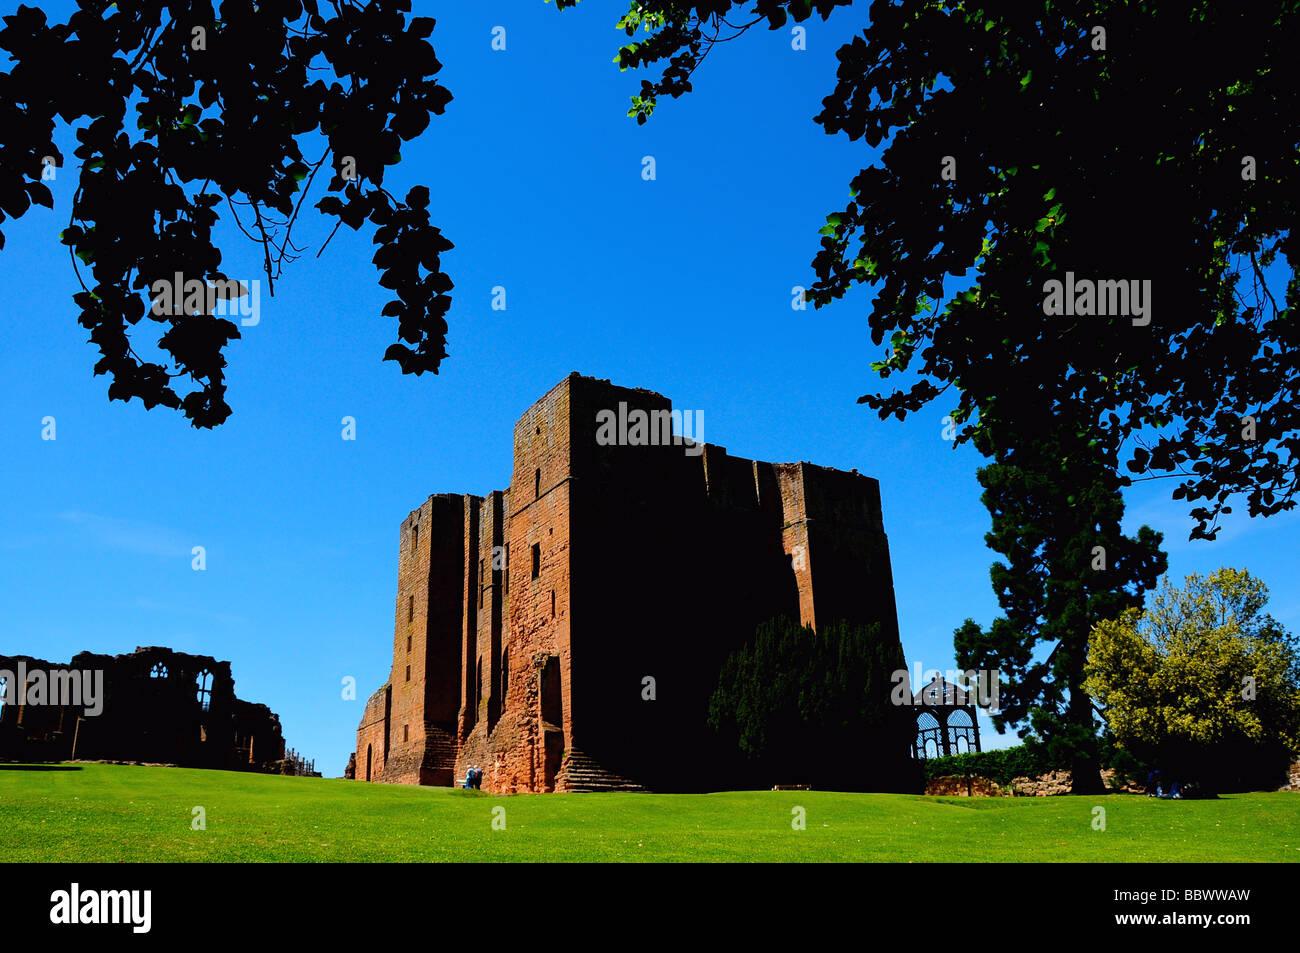 Kenilworth Castle, Warwickshire, UK - Stock Image